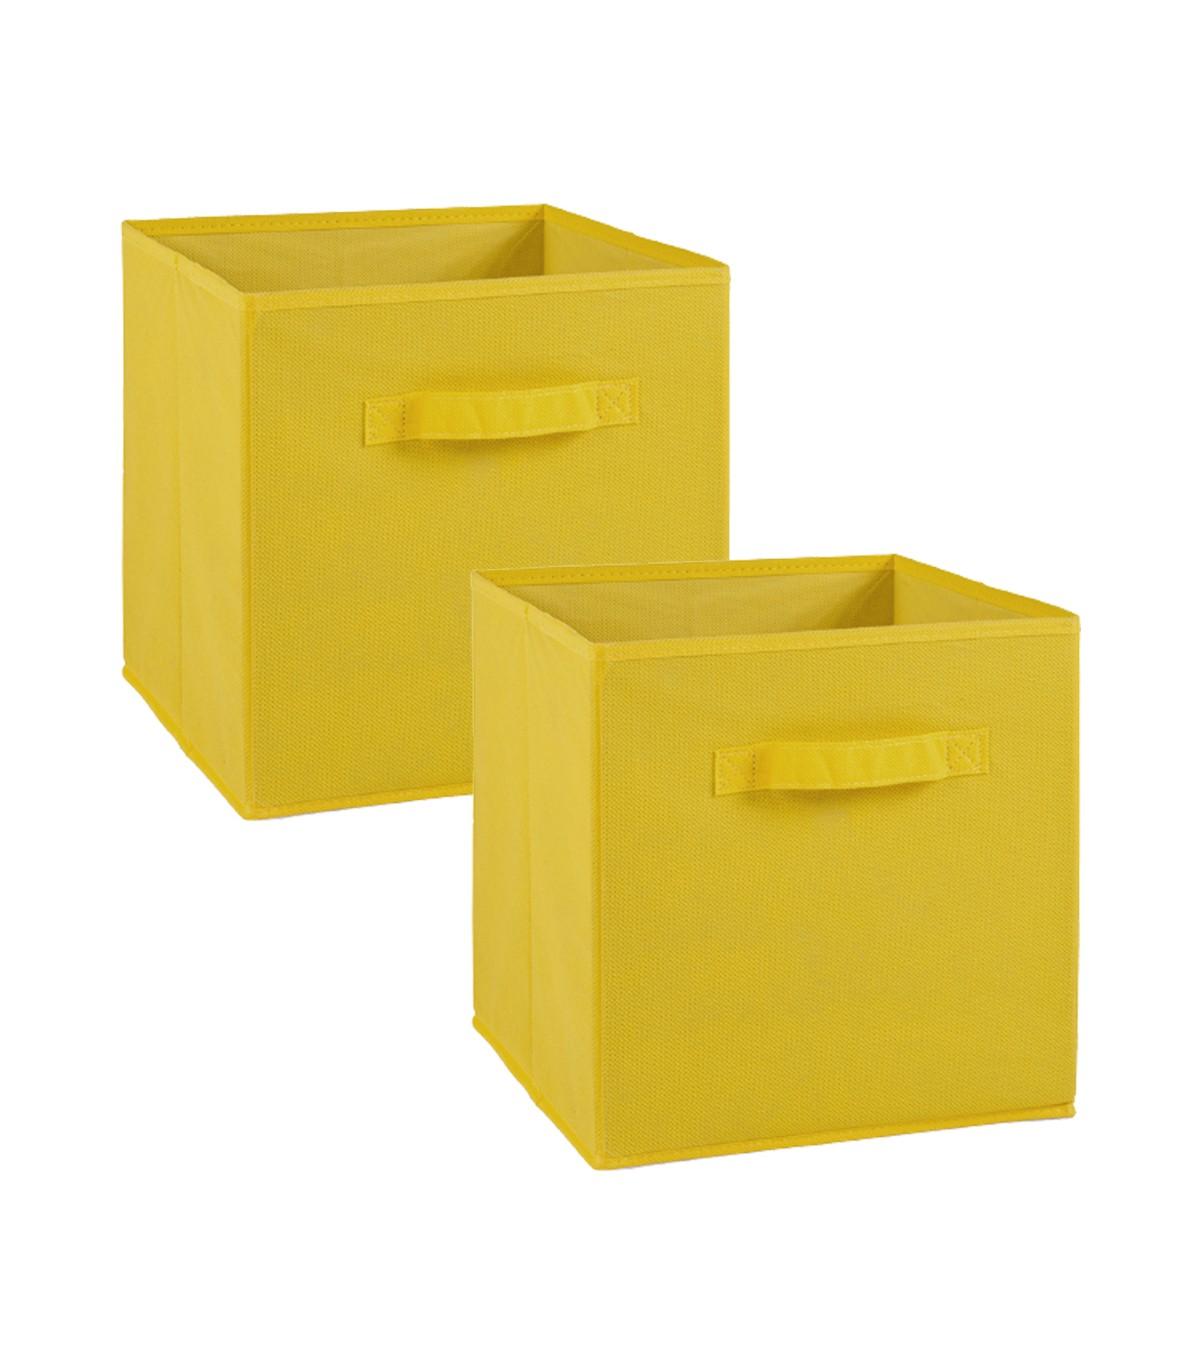 Lot de 2 cubes en intissé - 28x28x27cm - Jaune